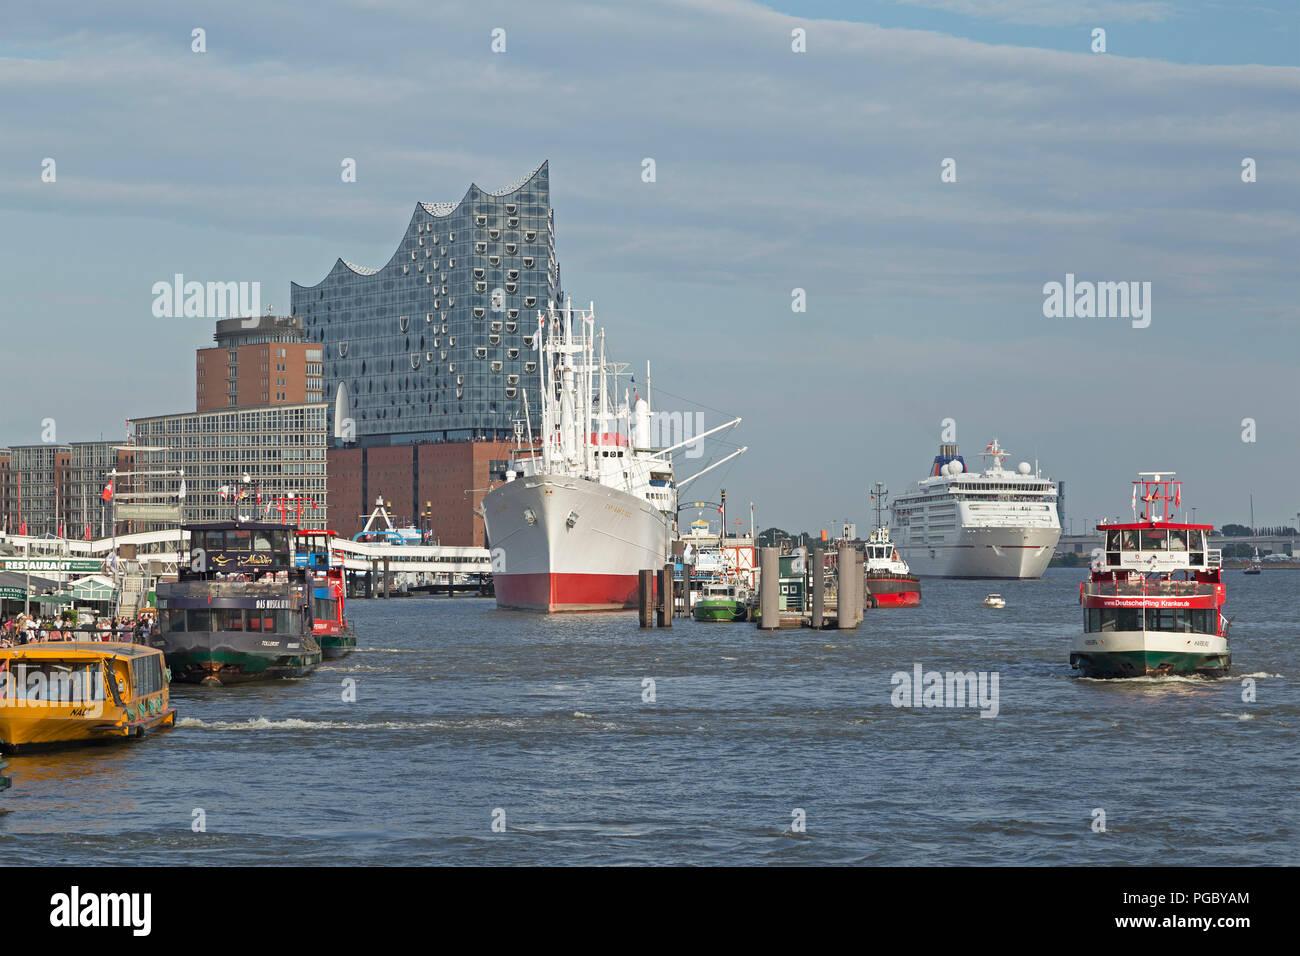 Elbe Philharmonic Hall and St. Pauli Landungsbruecken (jetties), cruise ship Europa 2, Hamburg, Germany - Stock Image